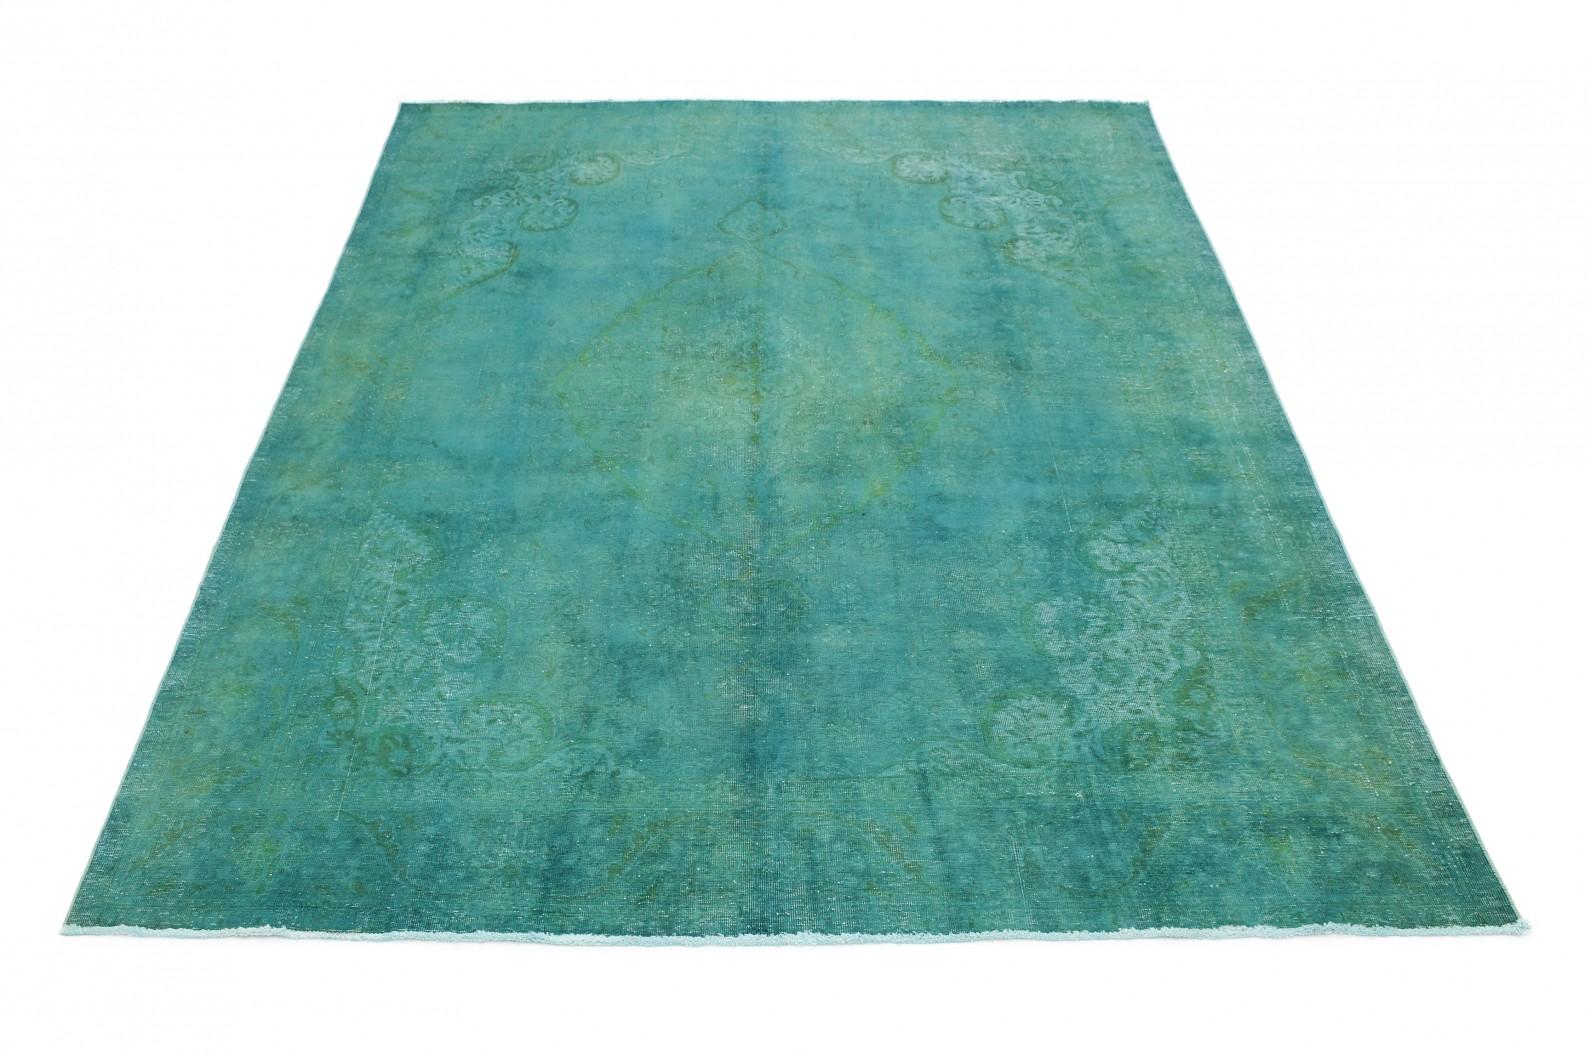 Vintage Rug Turquoise in 390x280 (1 / 6)